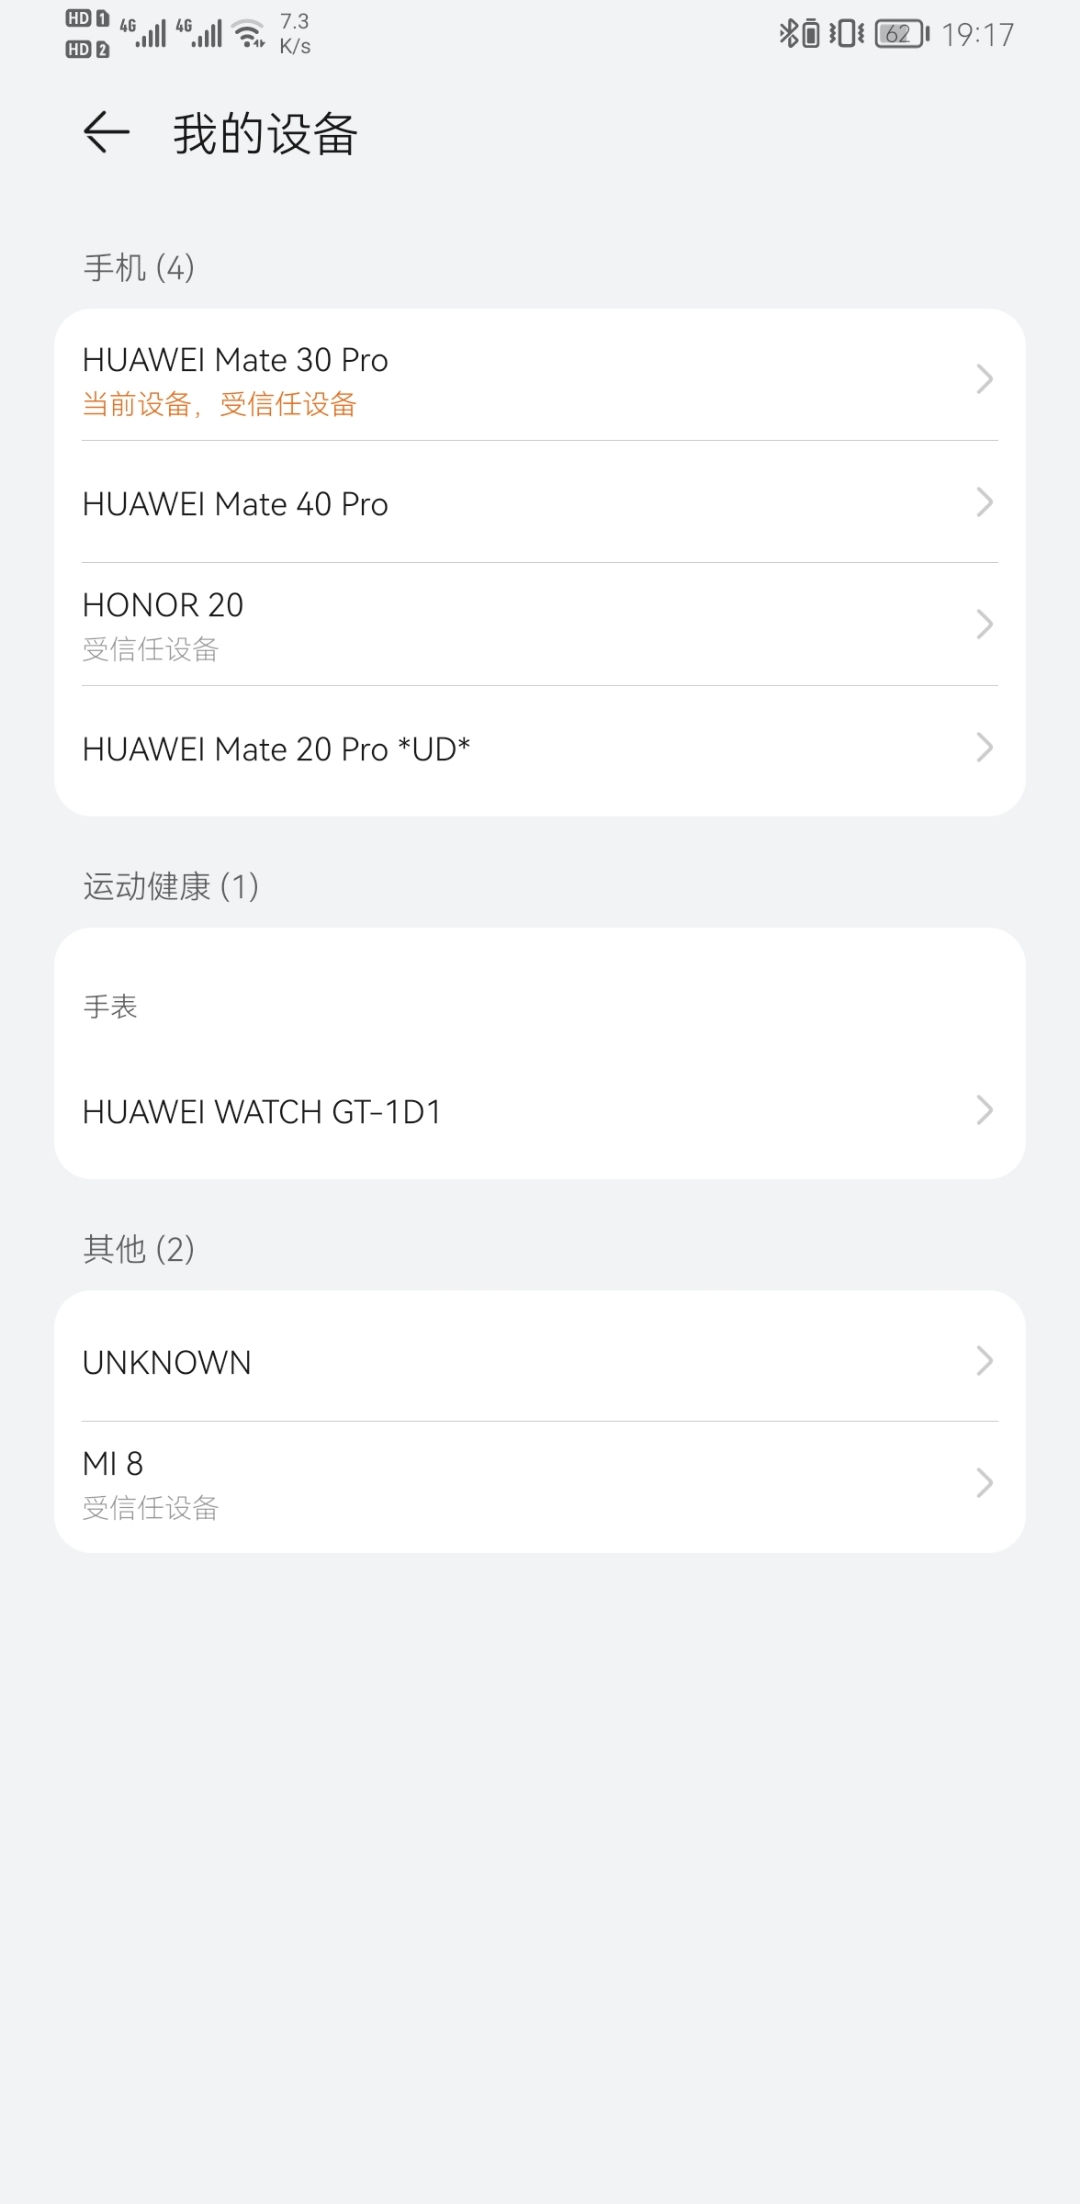 Screenshot_20210614_191727_com.huawei.hwid.jpg